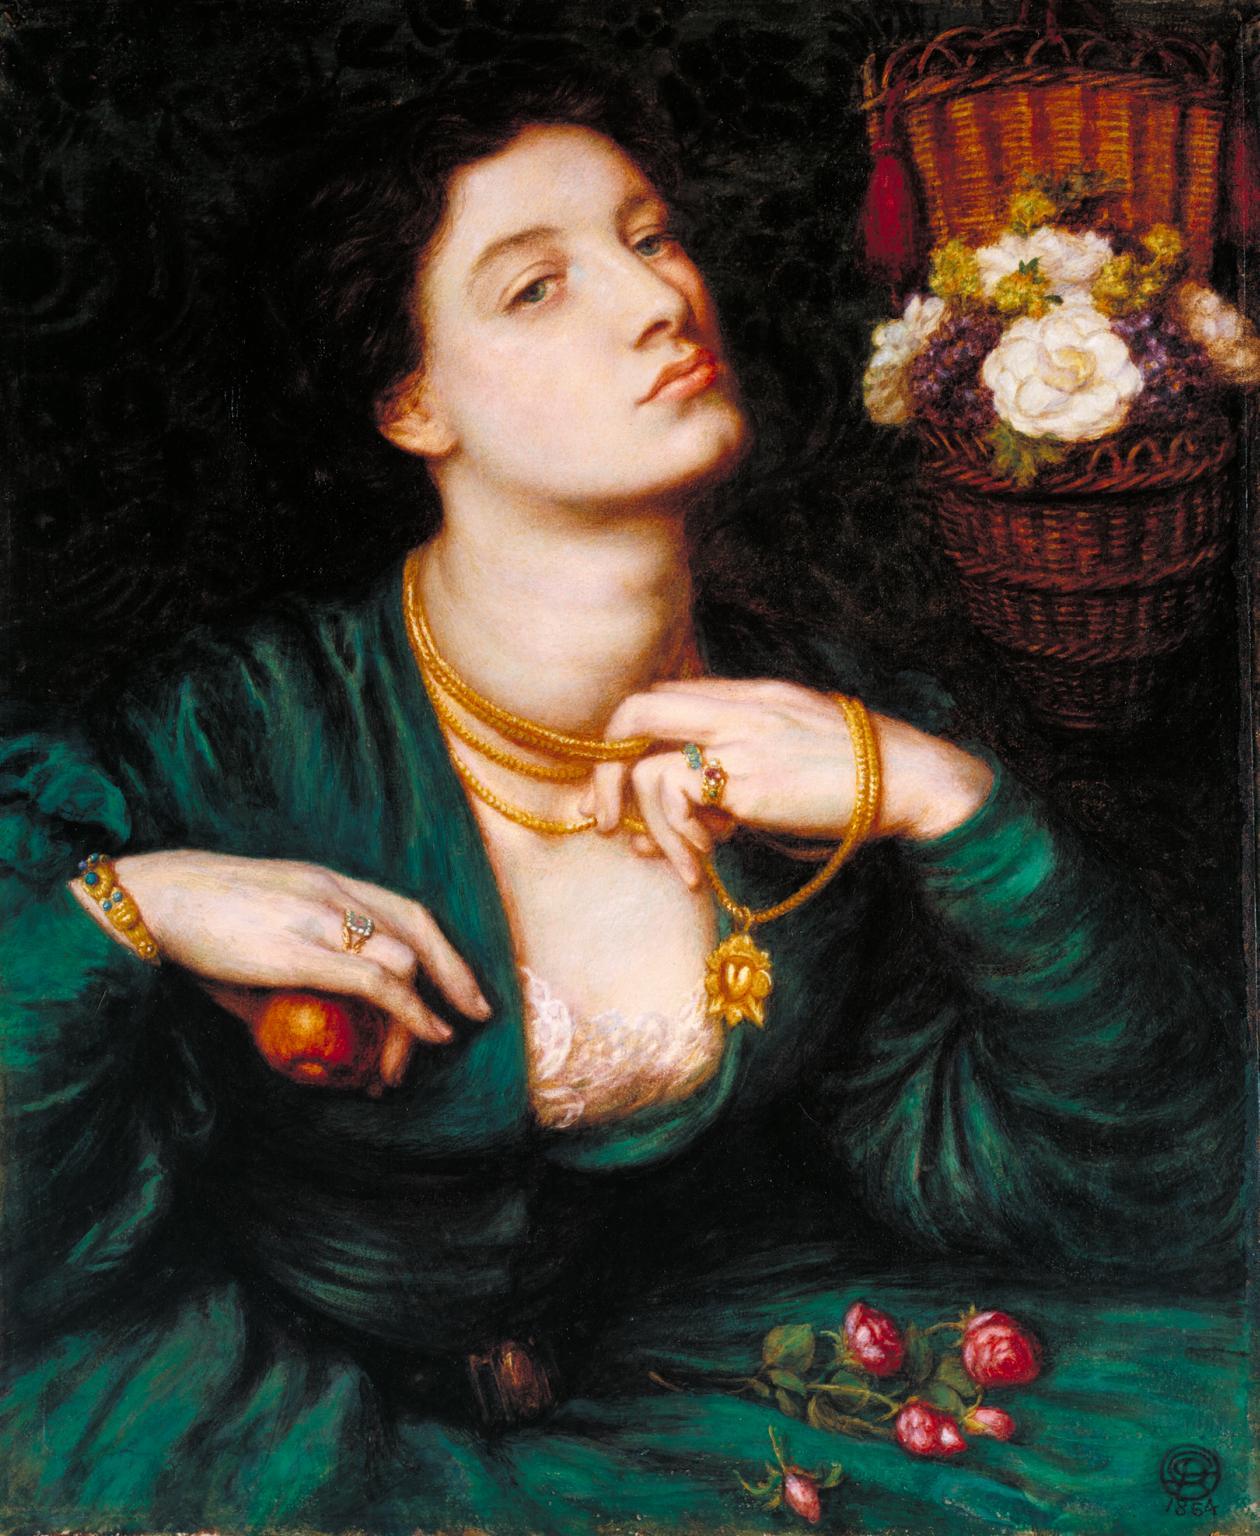 Dante Gabriel Rossetti's Monna Pomona presented by Wiki Commons